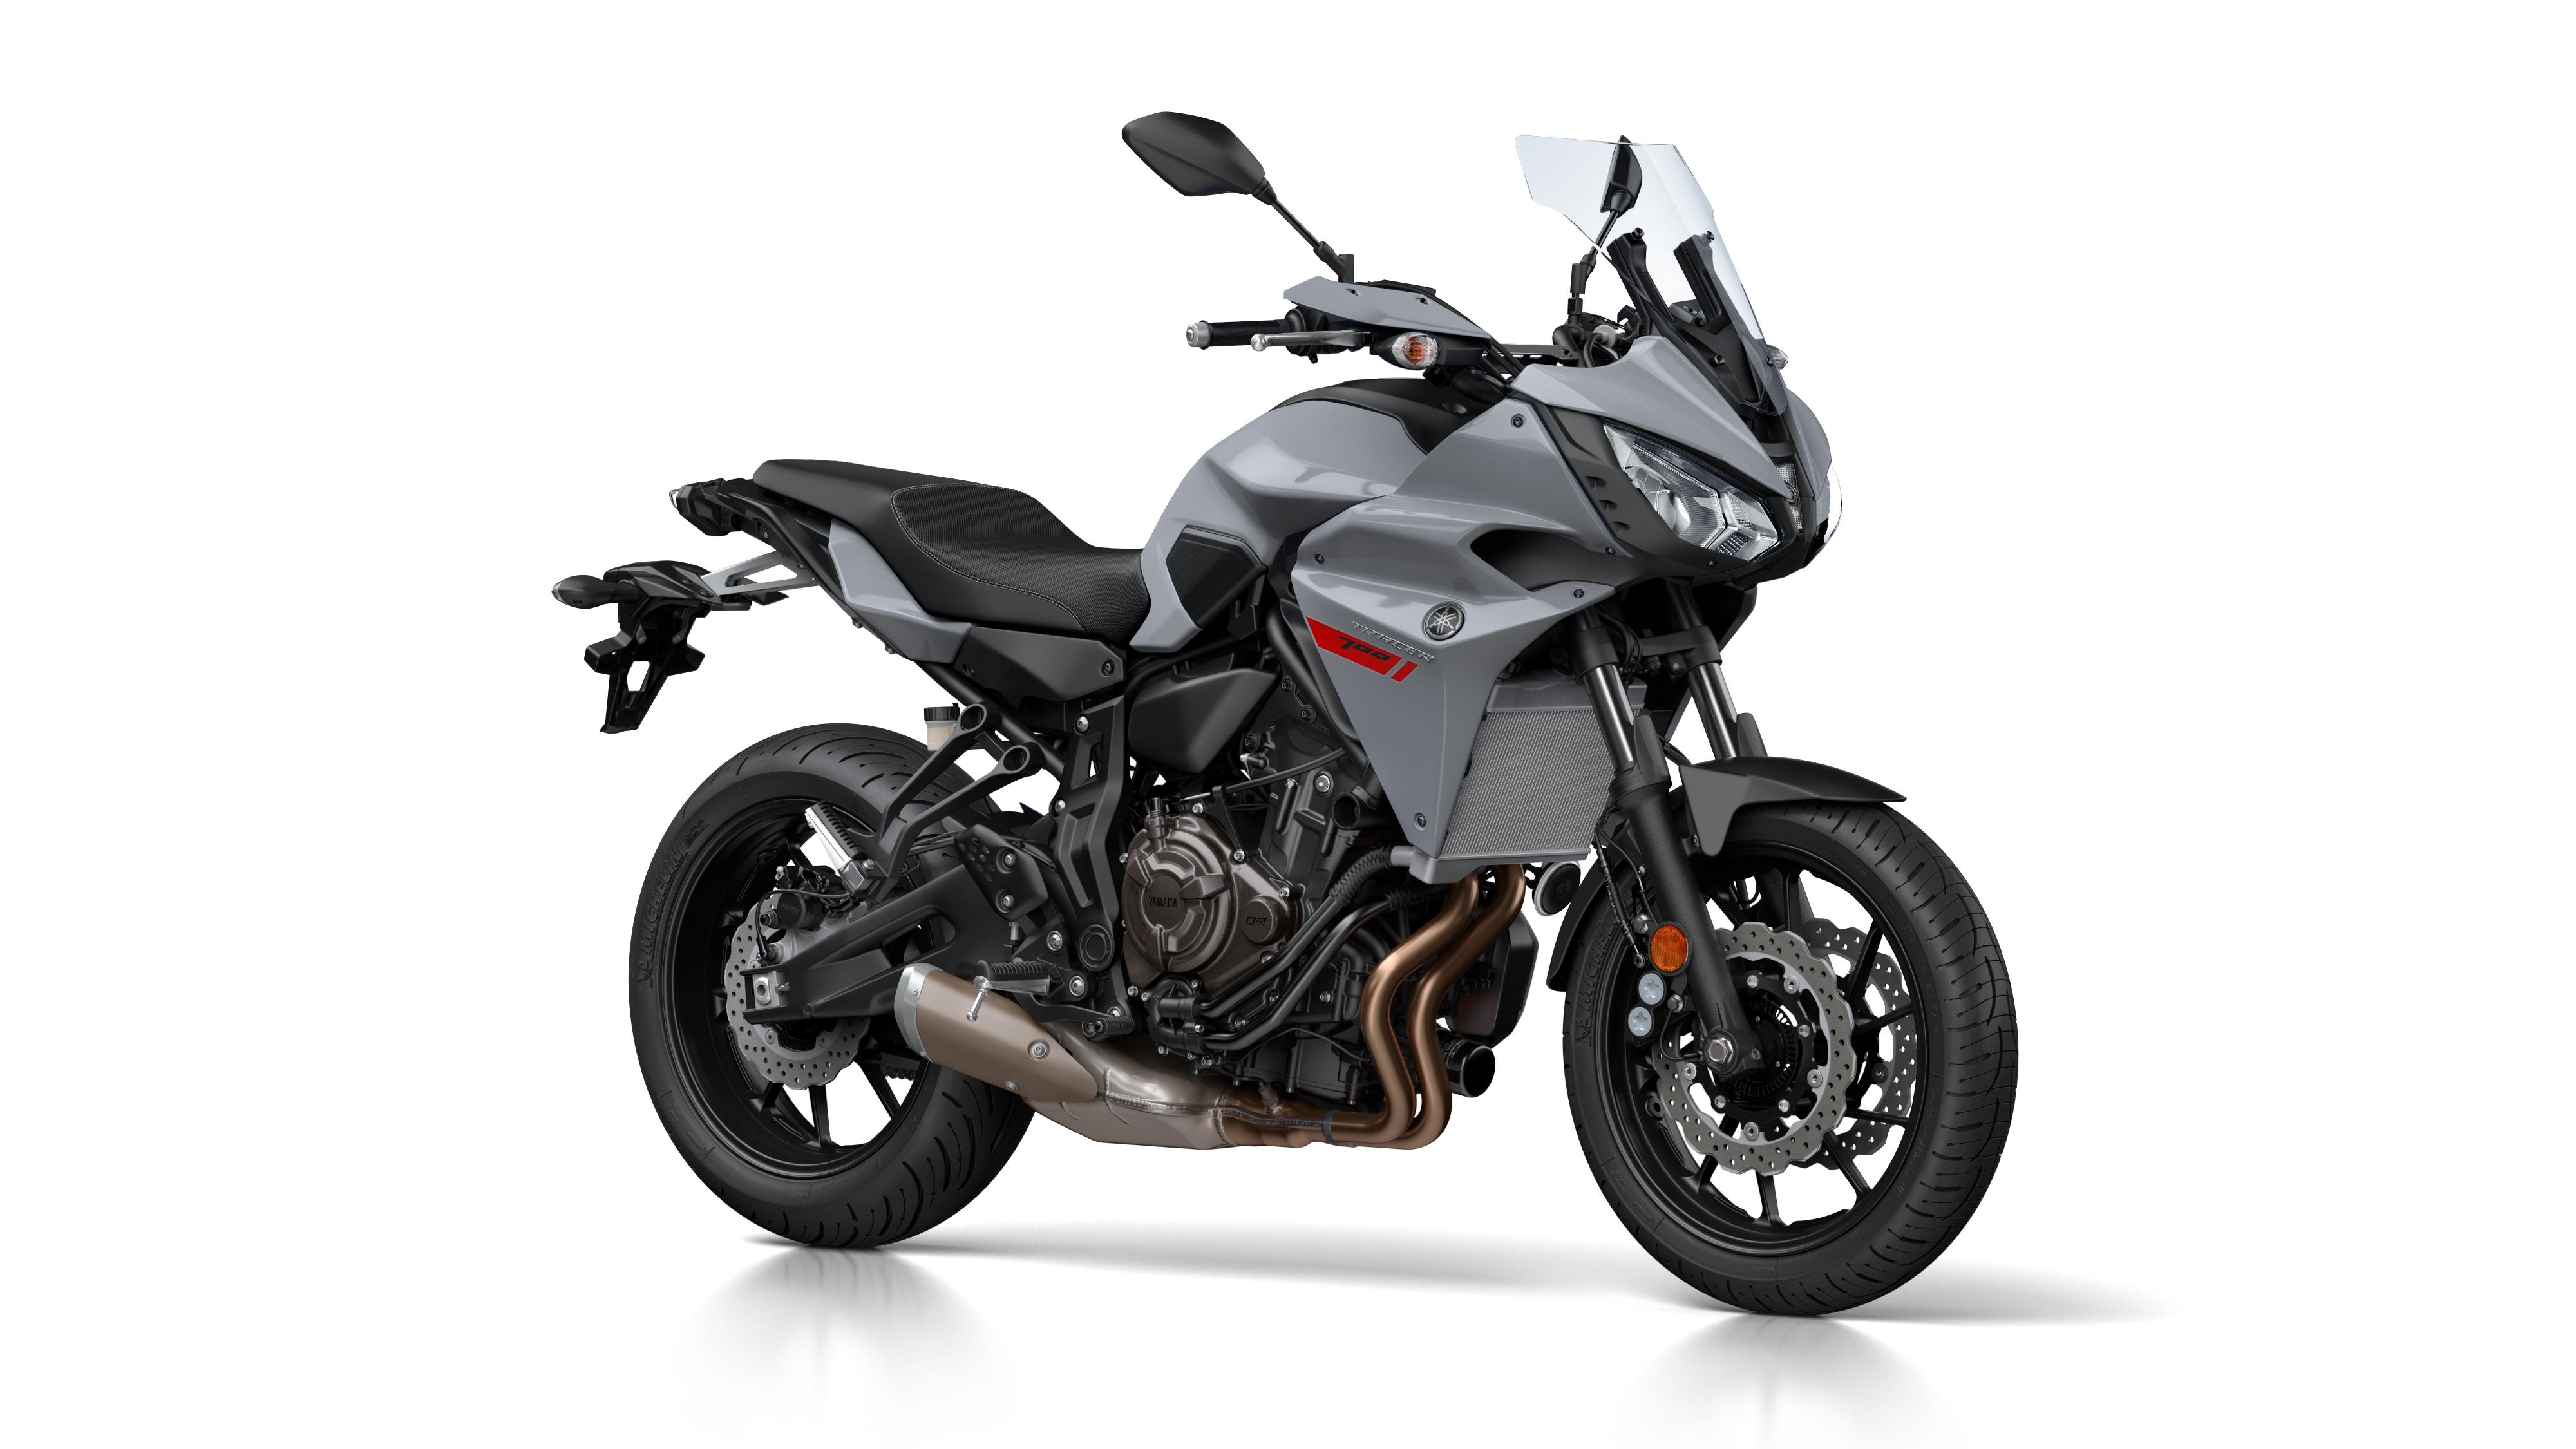 Yamaha Tracer 700 nu kopen